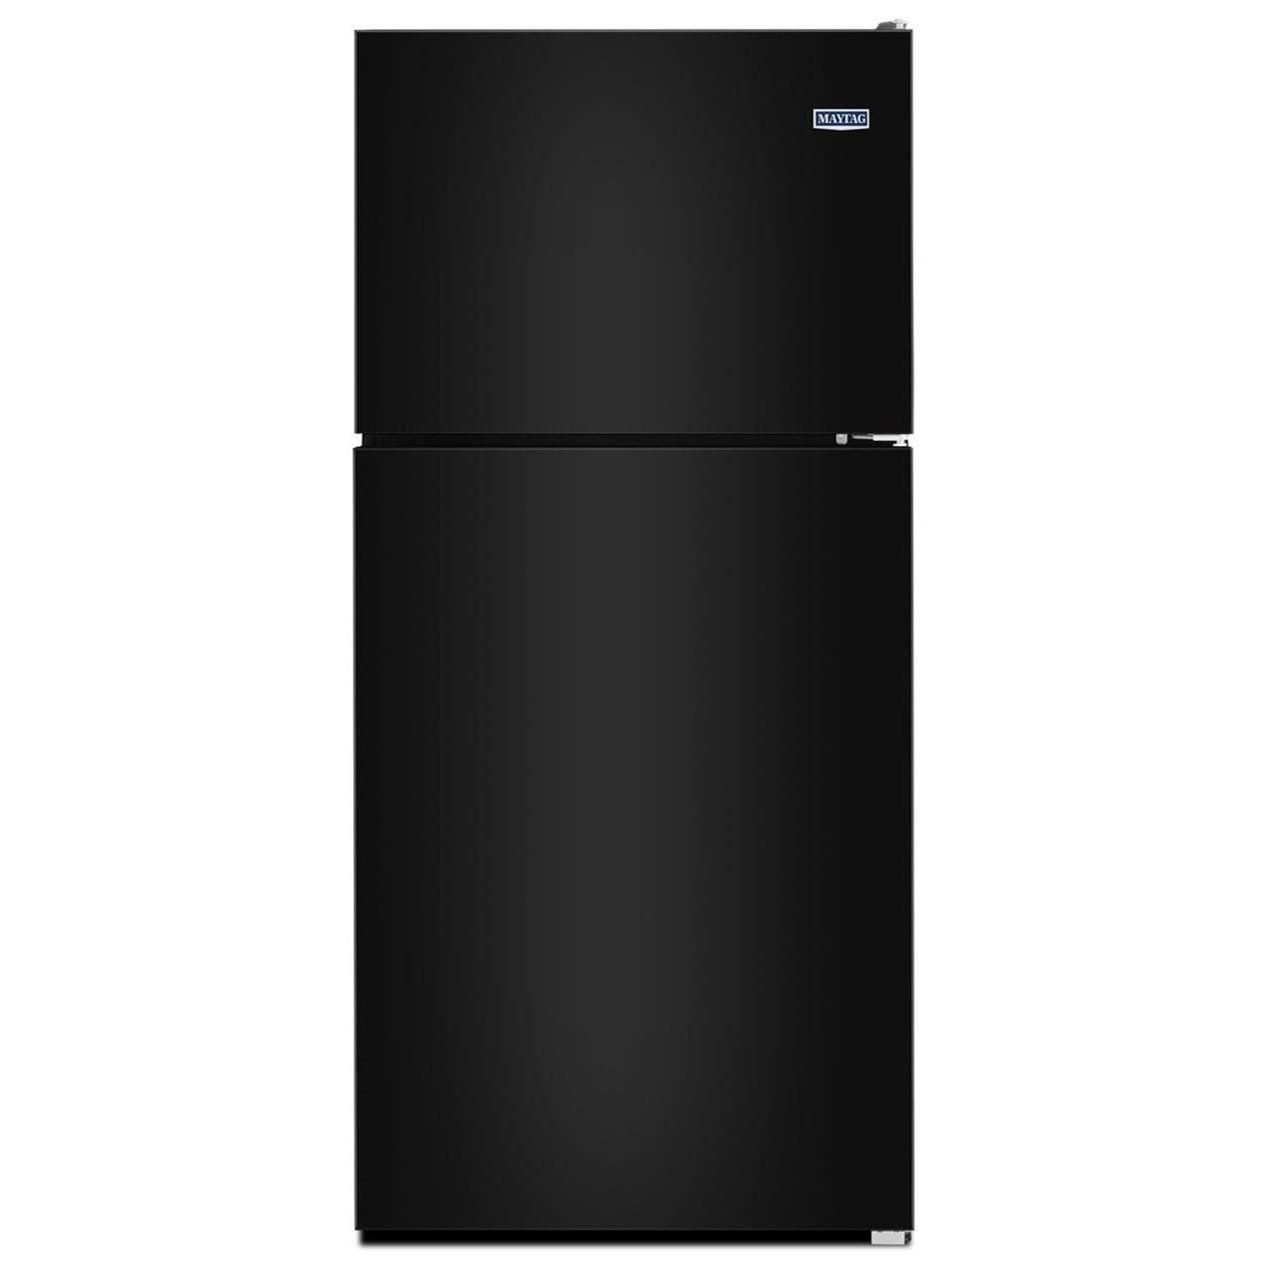 Maytag Top-Freezer Refrigerators 33-Inch Wide Top Freezer Refrigerator - Item Number: MRT311FFFE